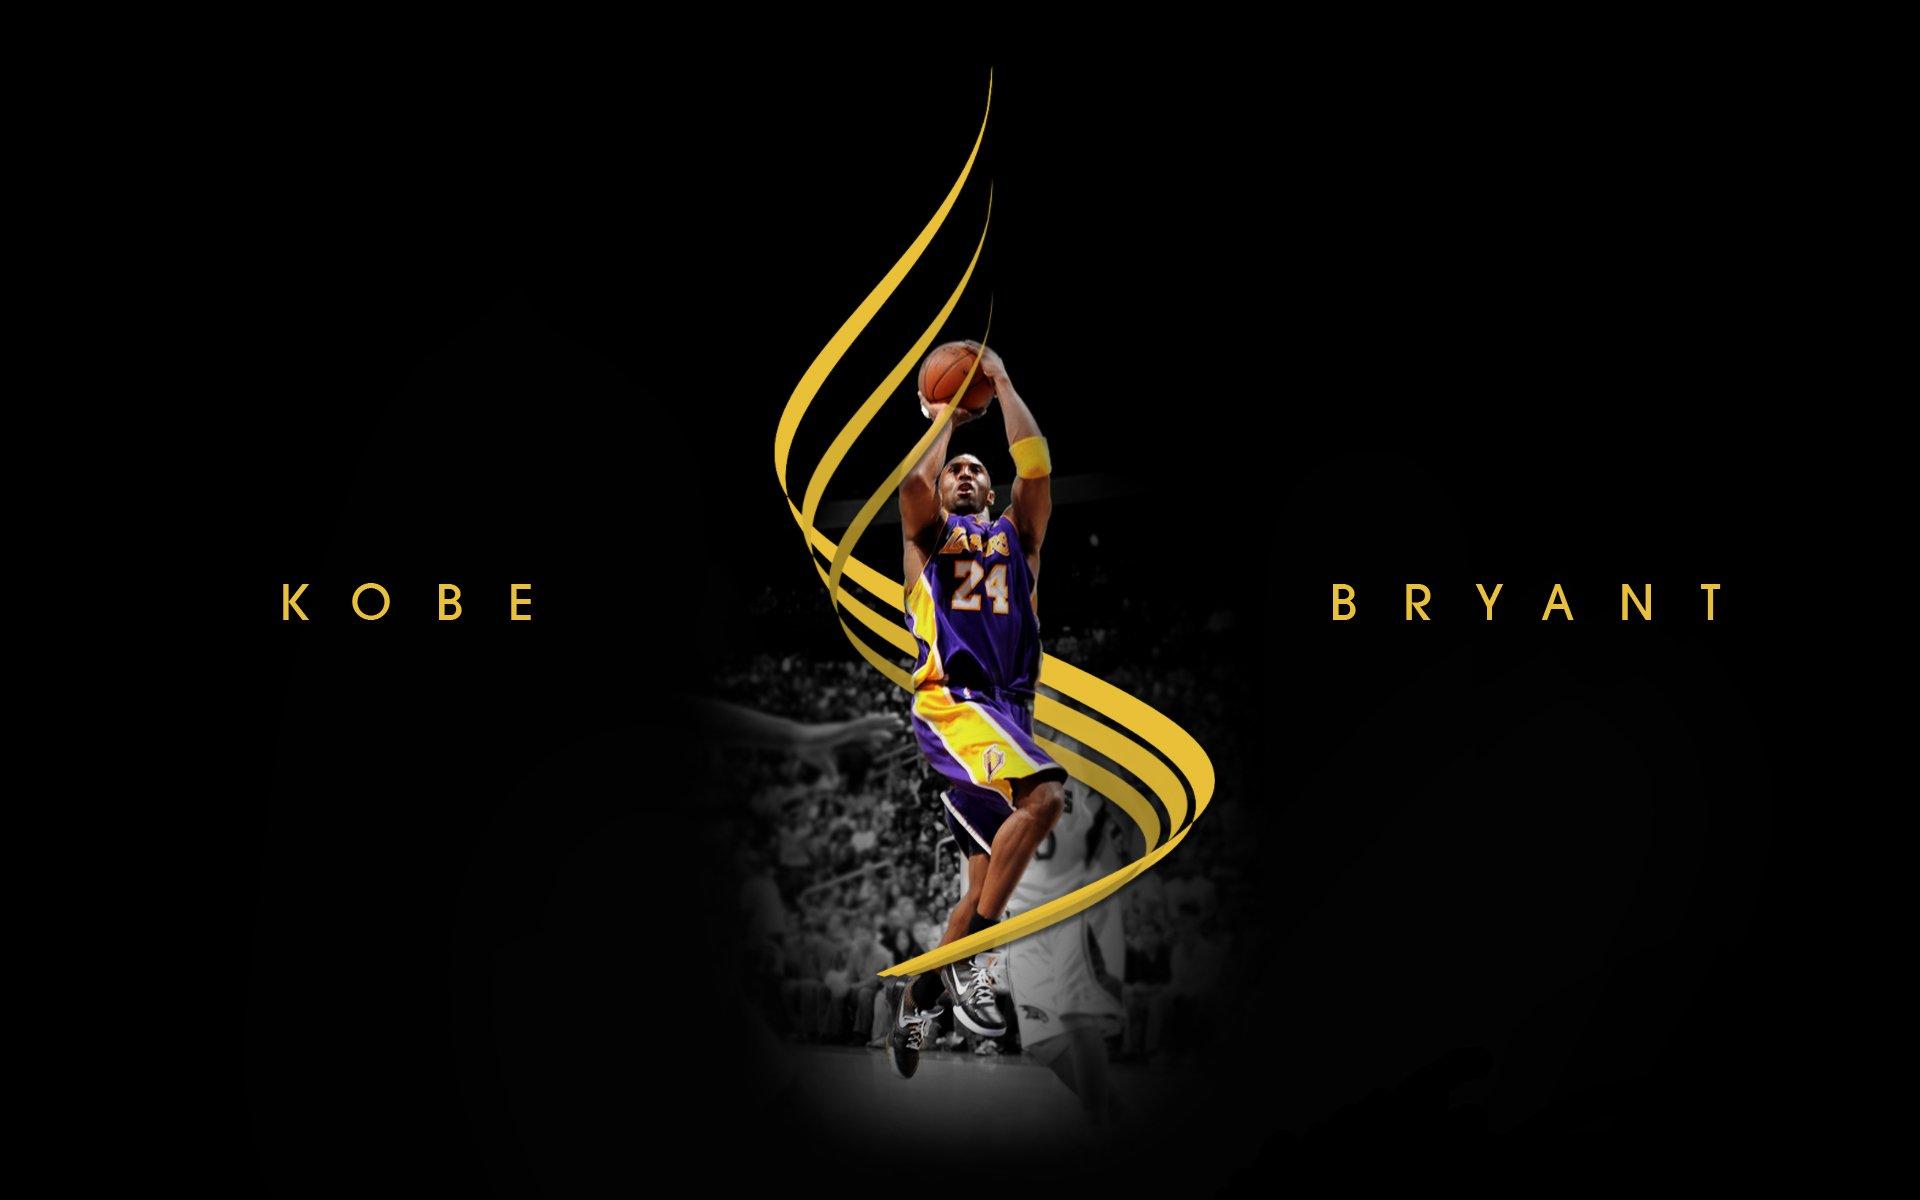 Kobe Logo Kobe Logo Nike Kobe Logo 1920x1200